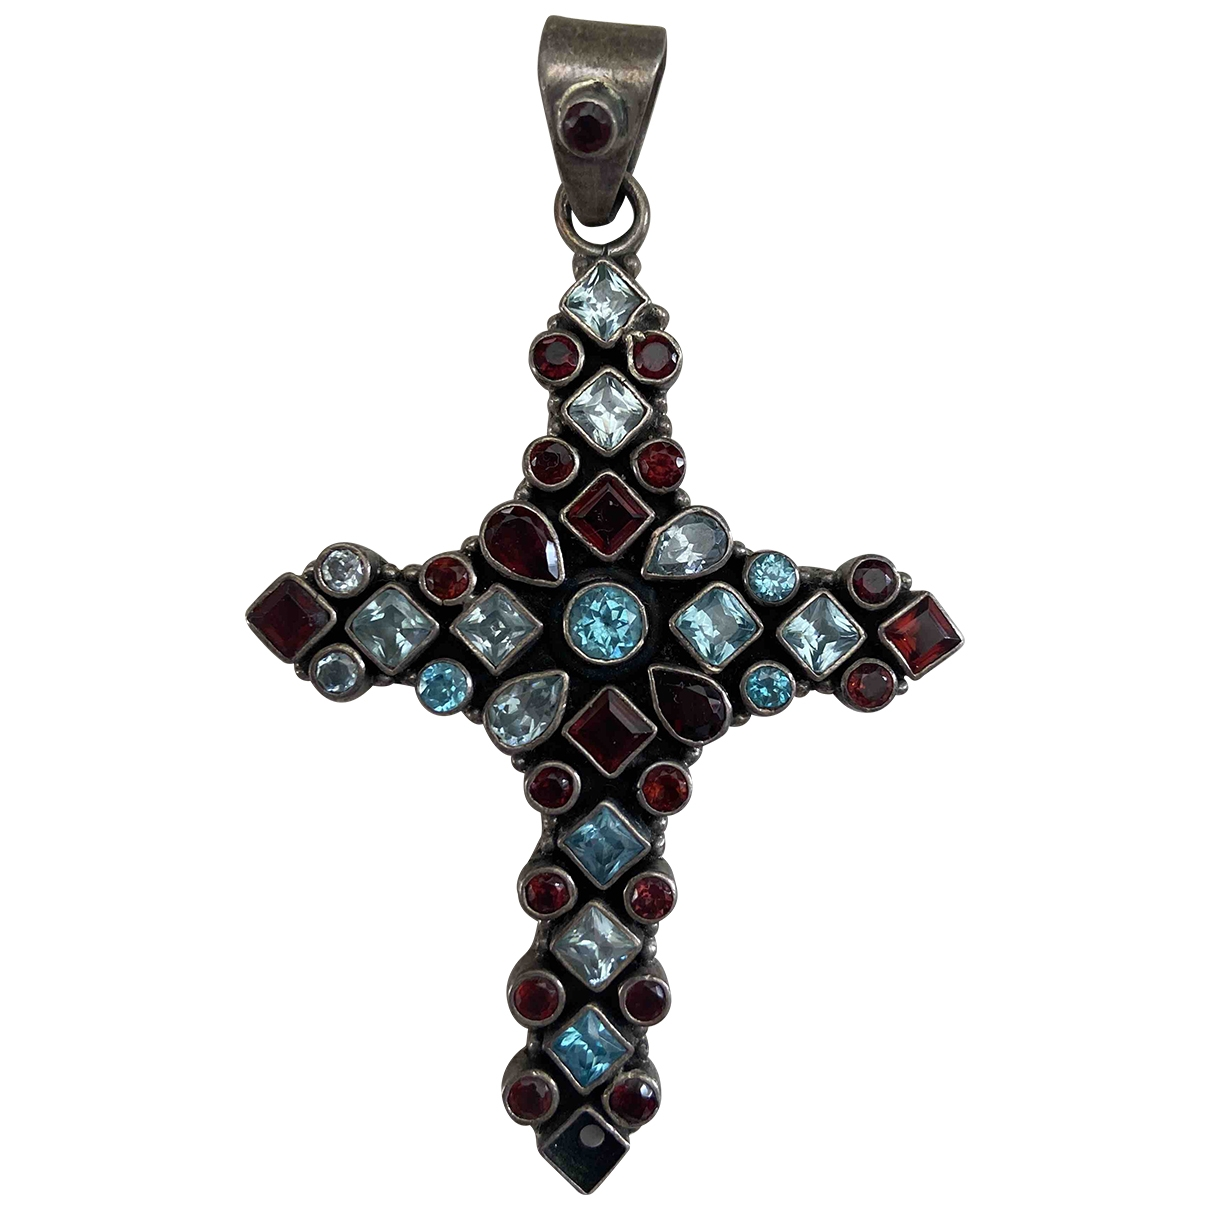 Non Signe / Unsigned Croix Anhaenger in  Bunt Silber